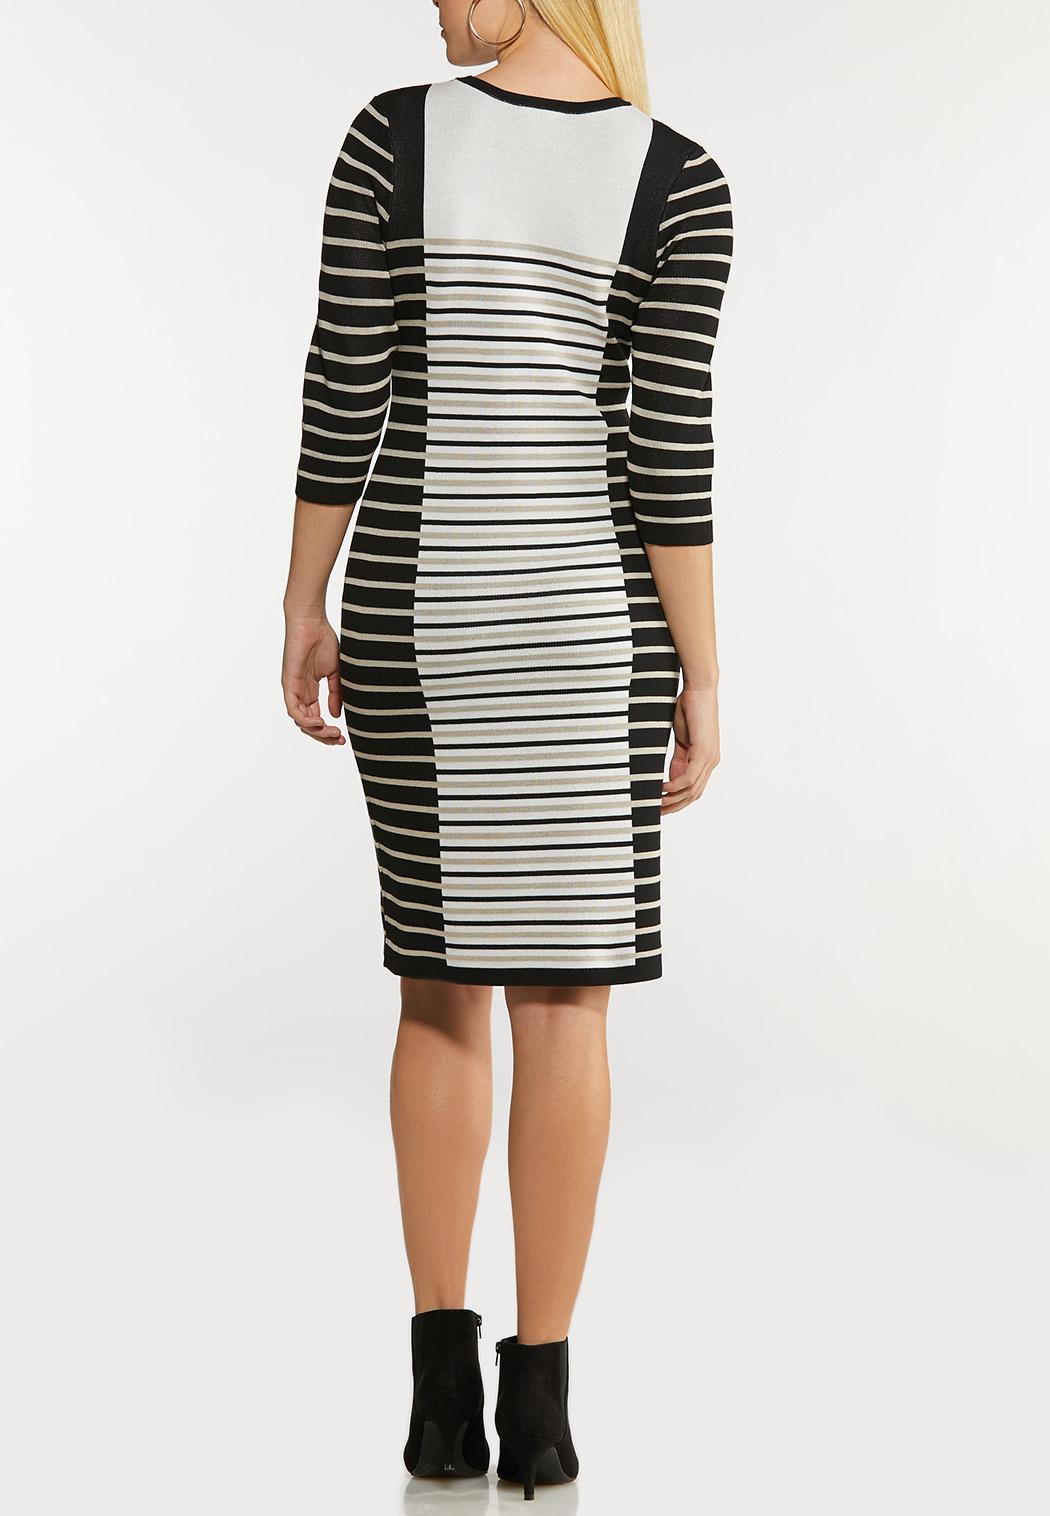 Mixed Stripe Dress (Item #44129600)